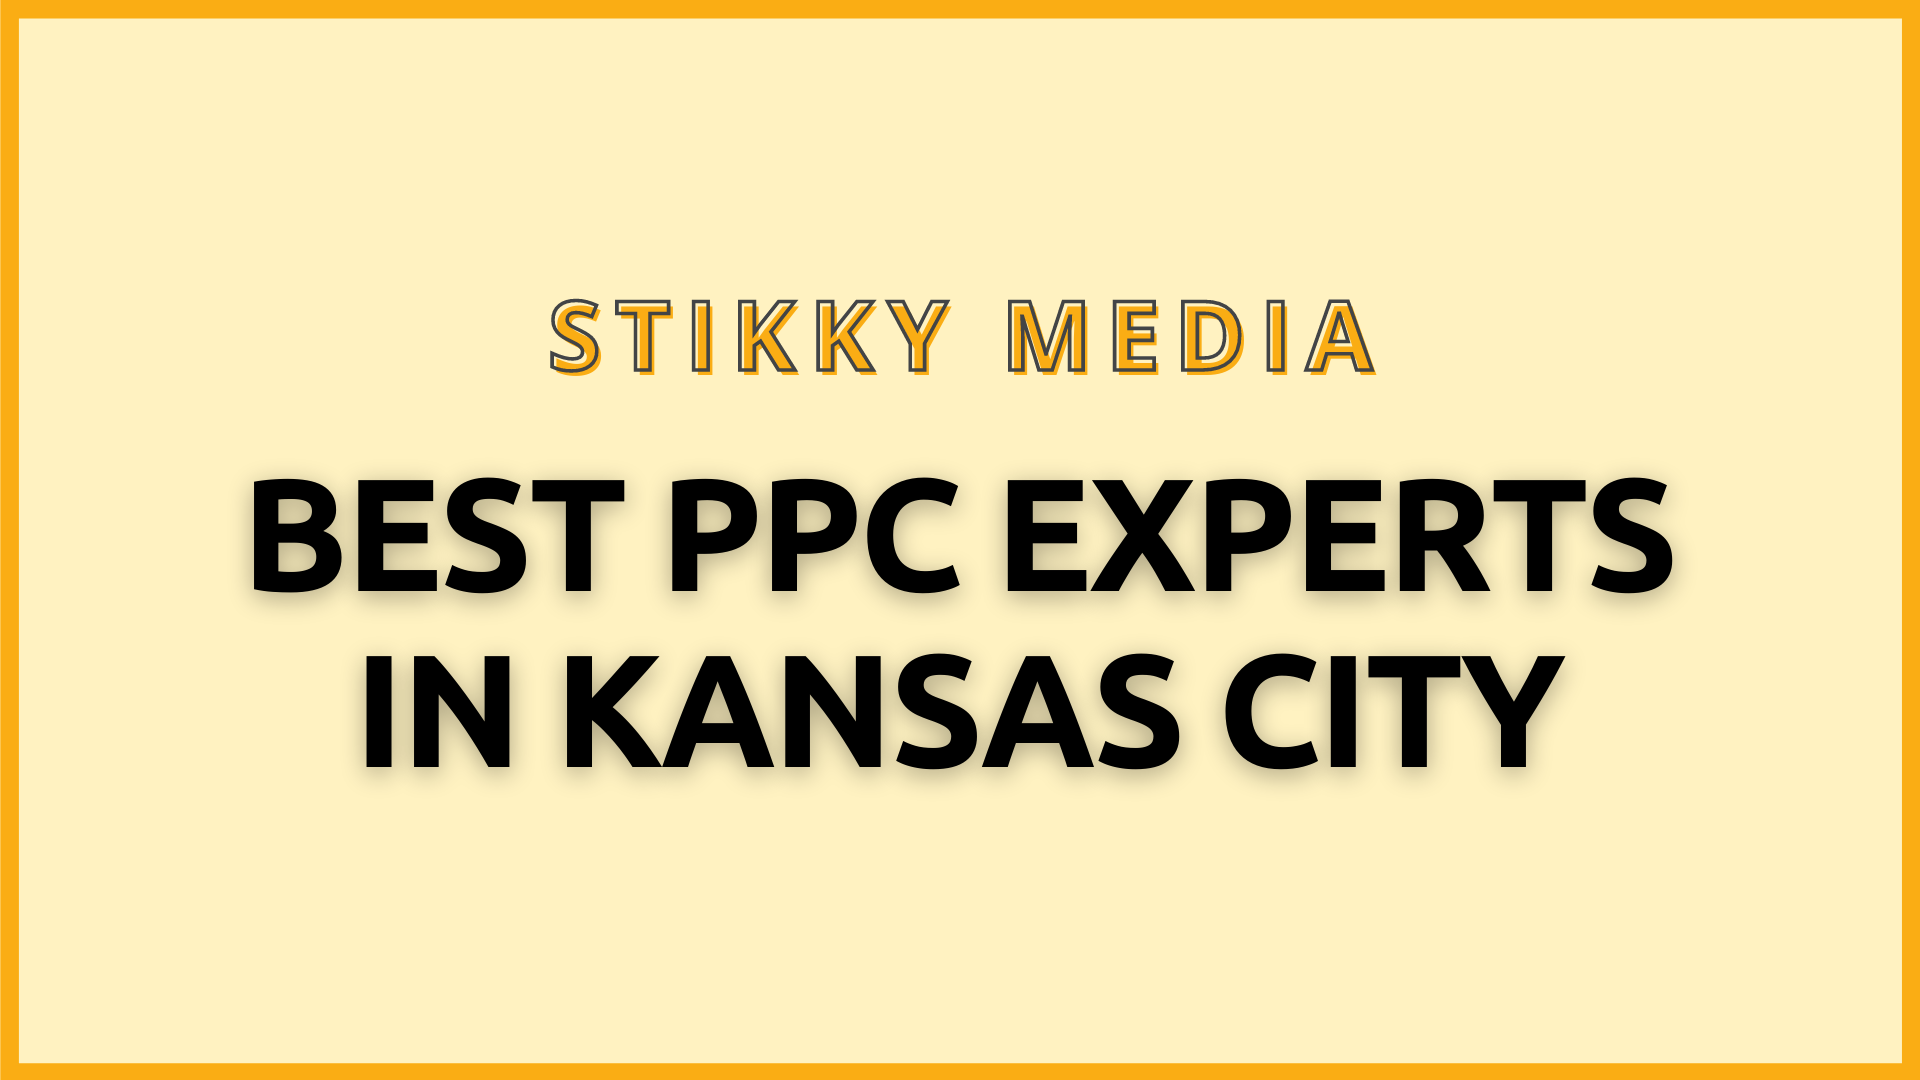 PPC Management in Kansas City - Stikky Media